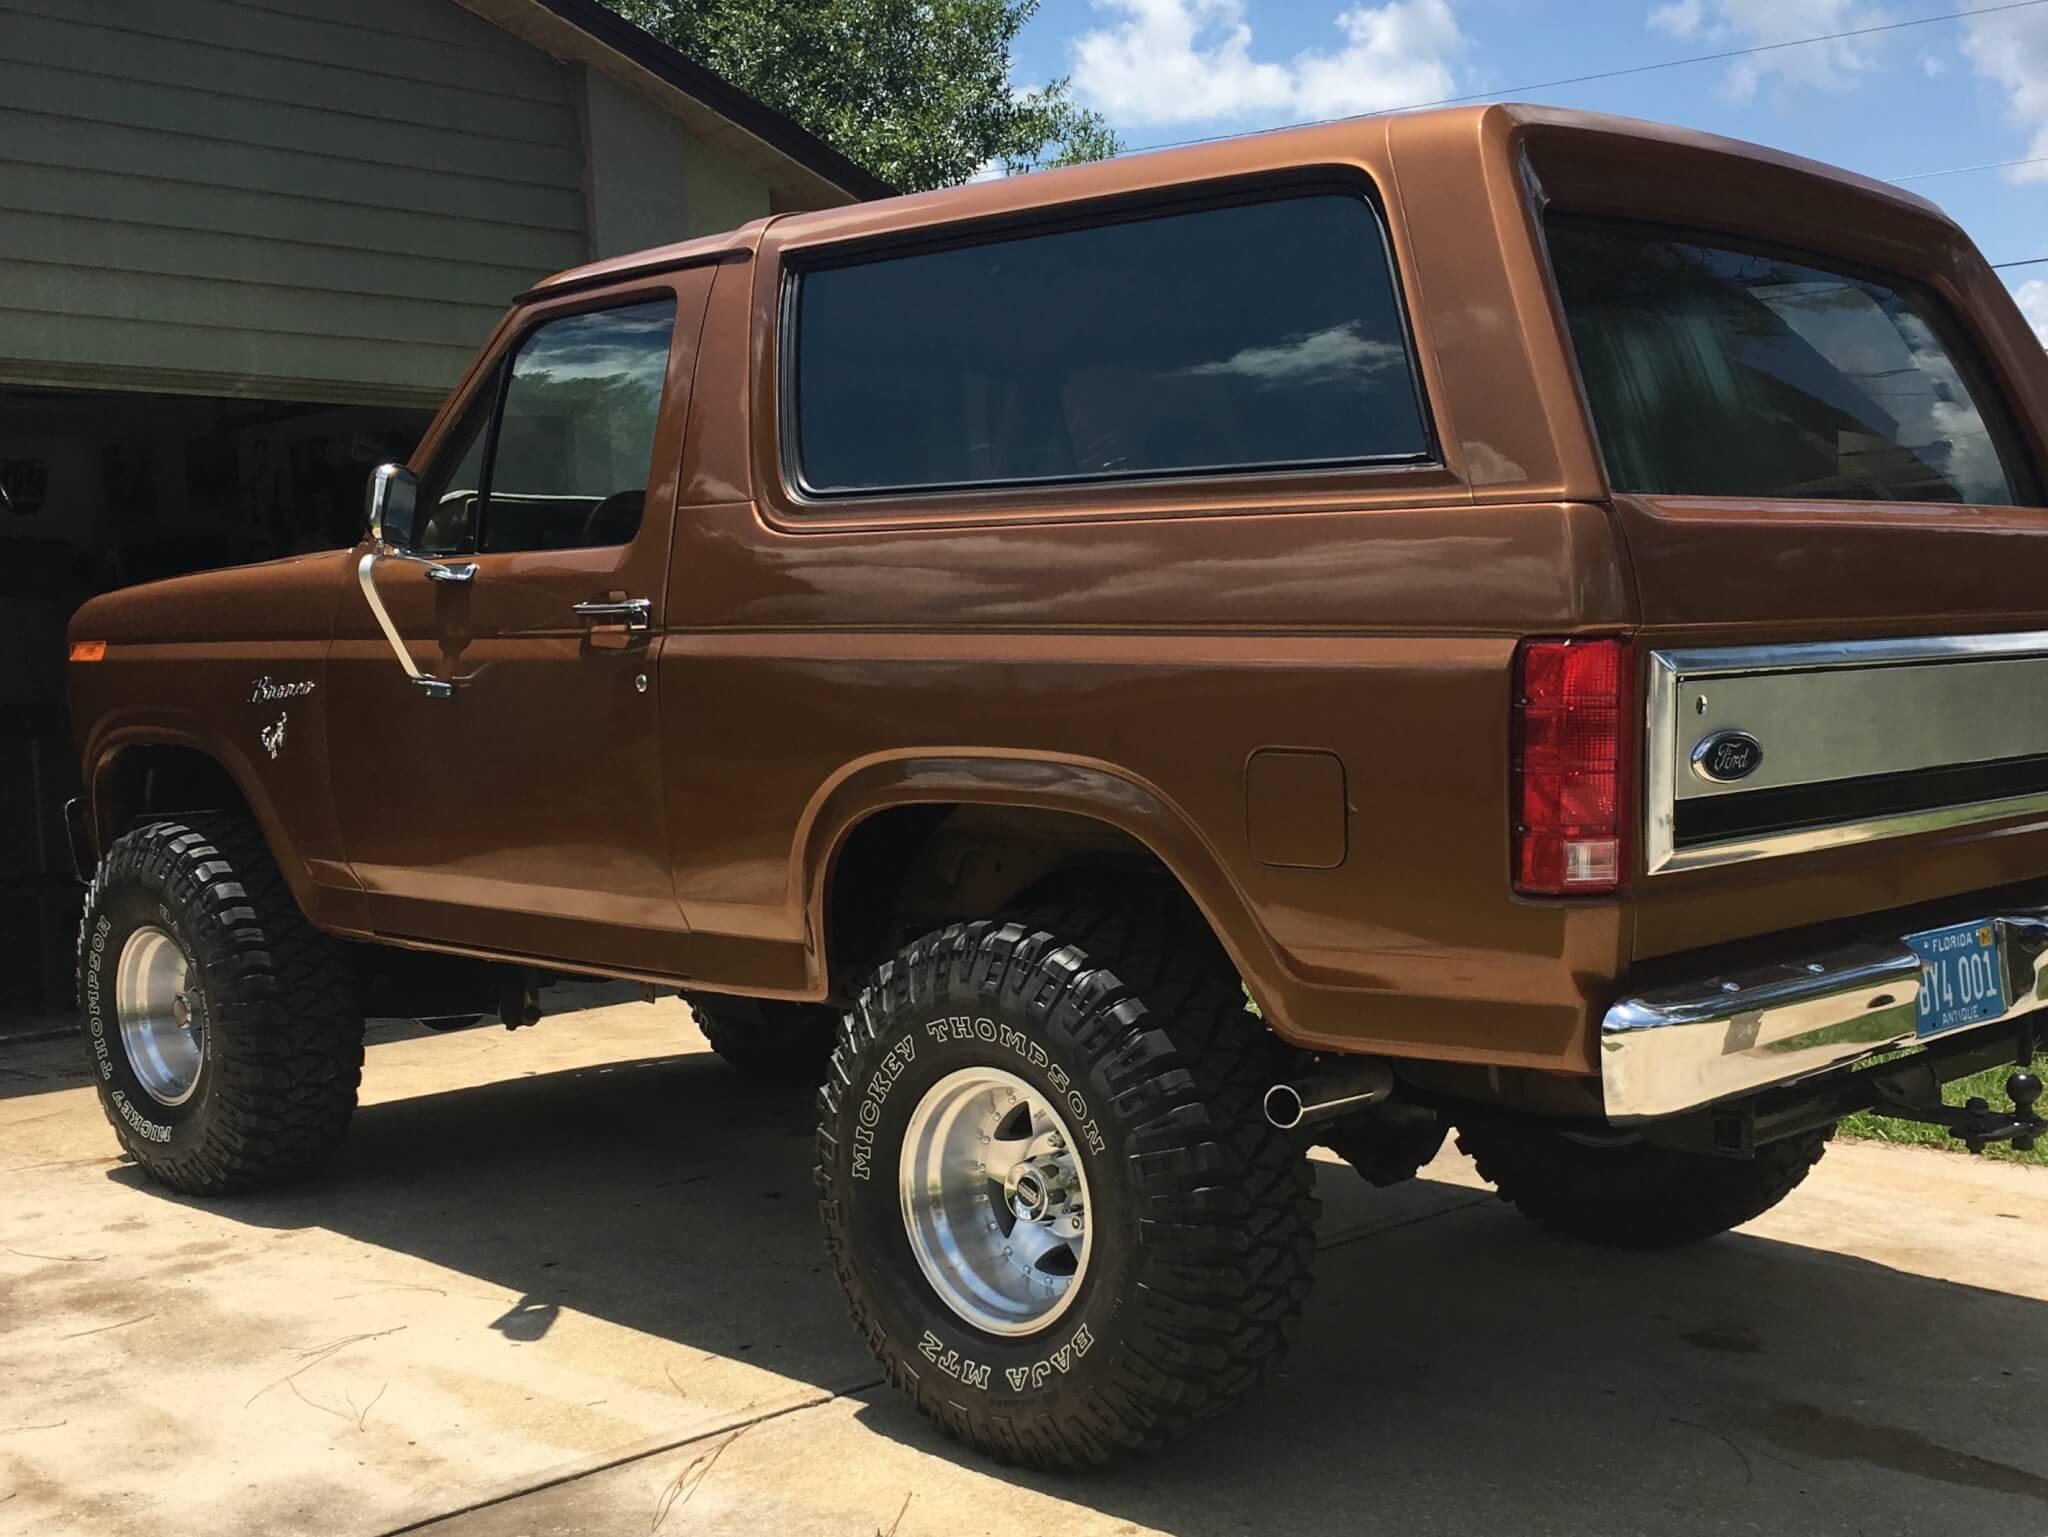 1985 Ford Bronco Jeff S LMC Truck Life